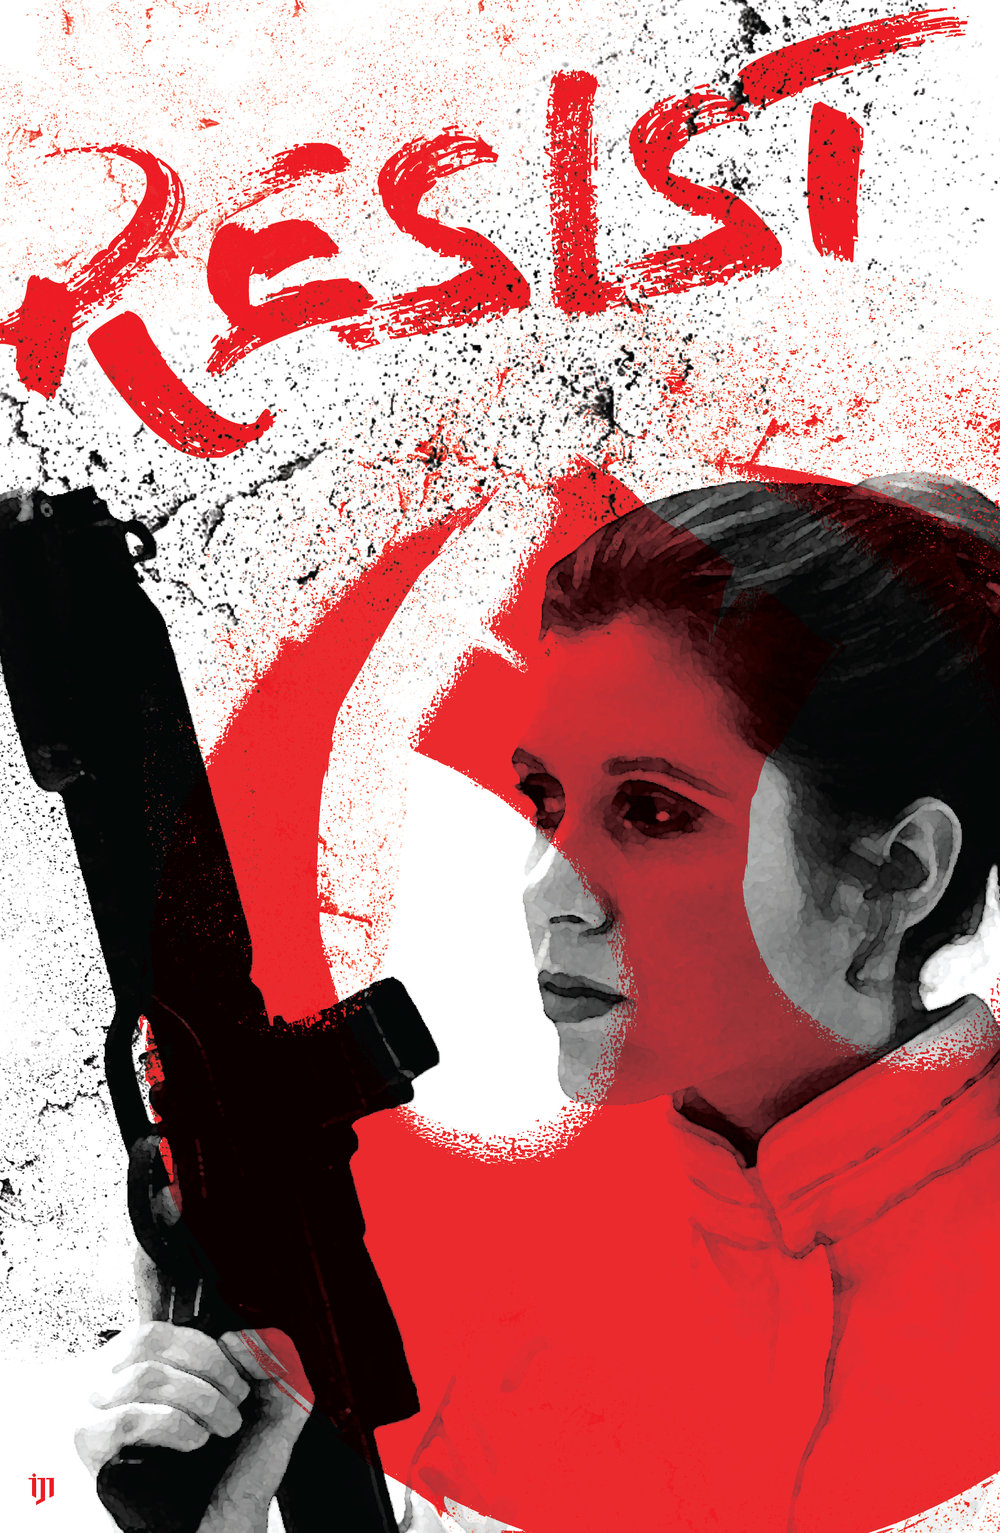 Leia Resist.jpg